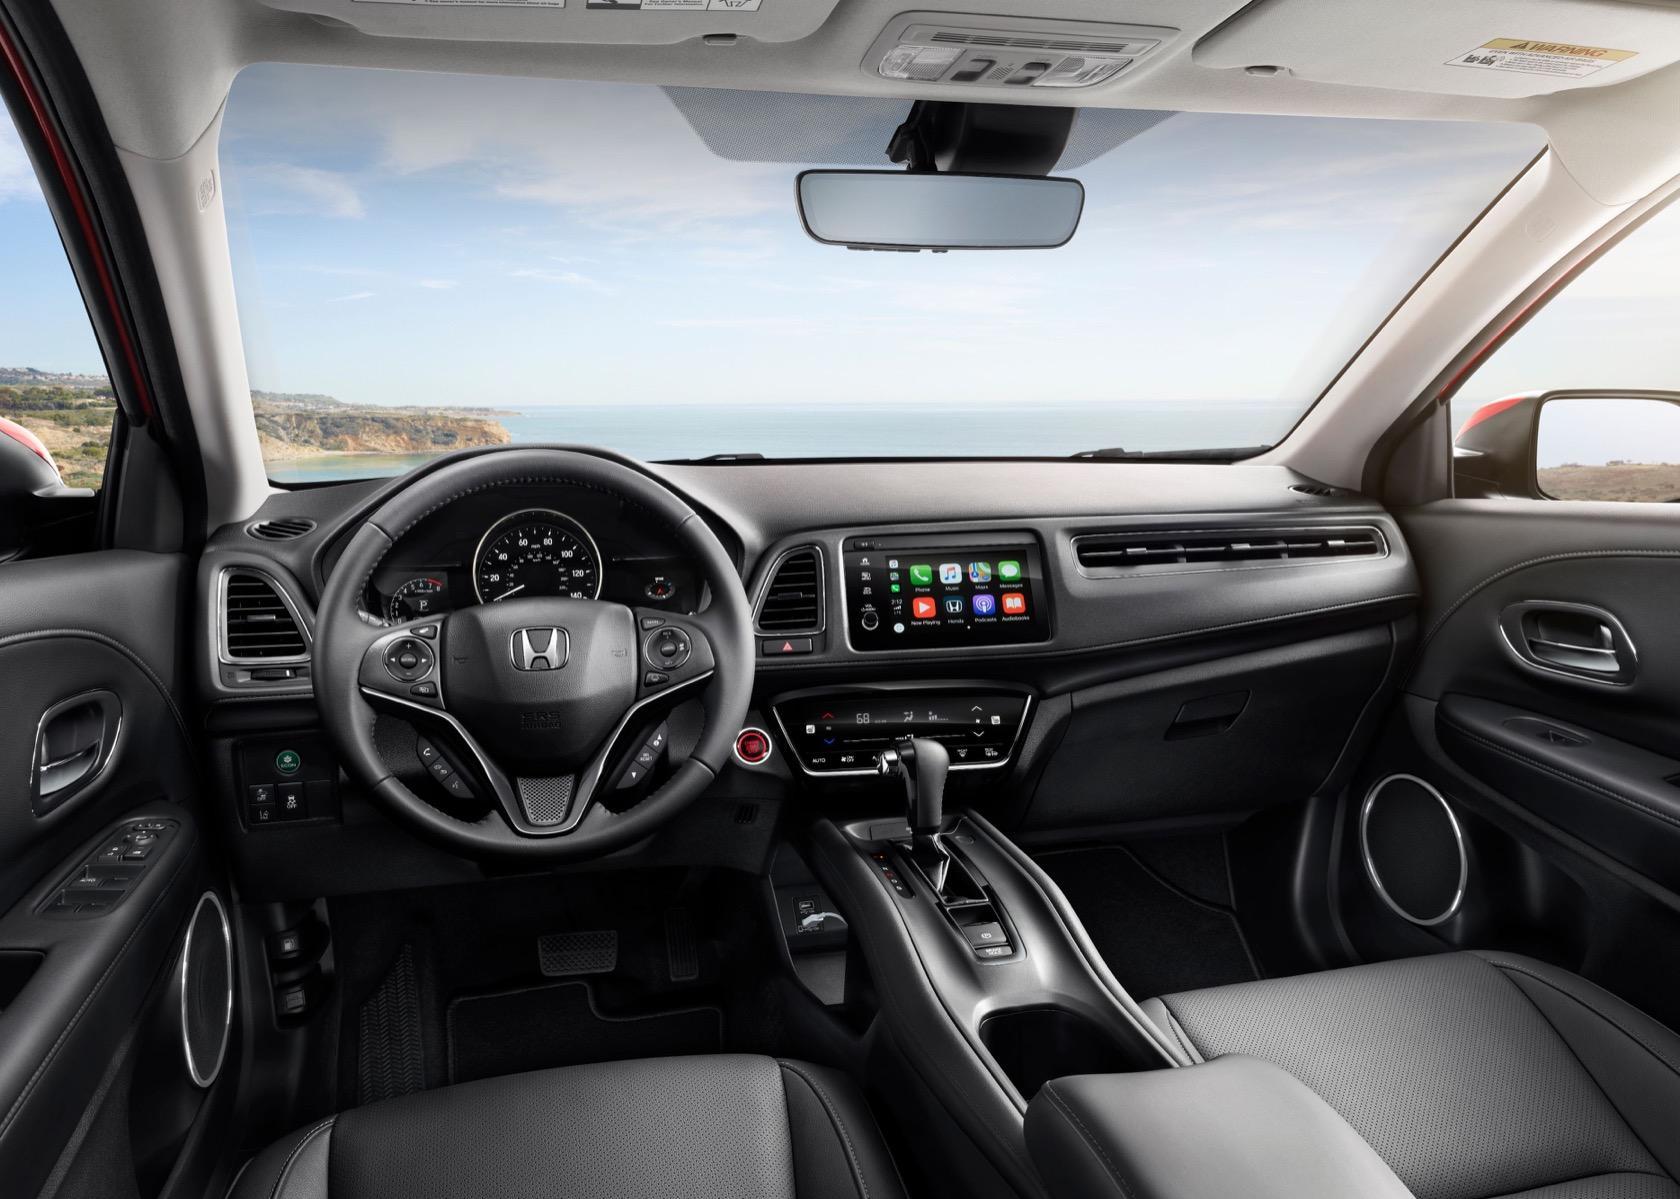 2019 Honda Pilot and HR-V load up on safety and cabin tech - SlashGear